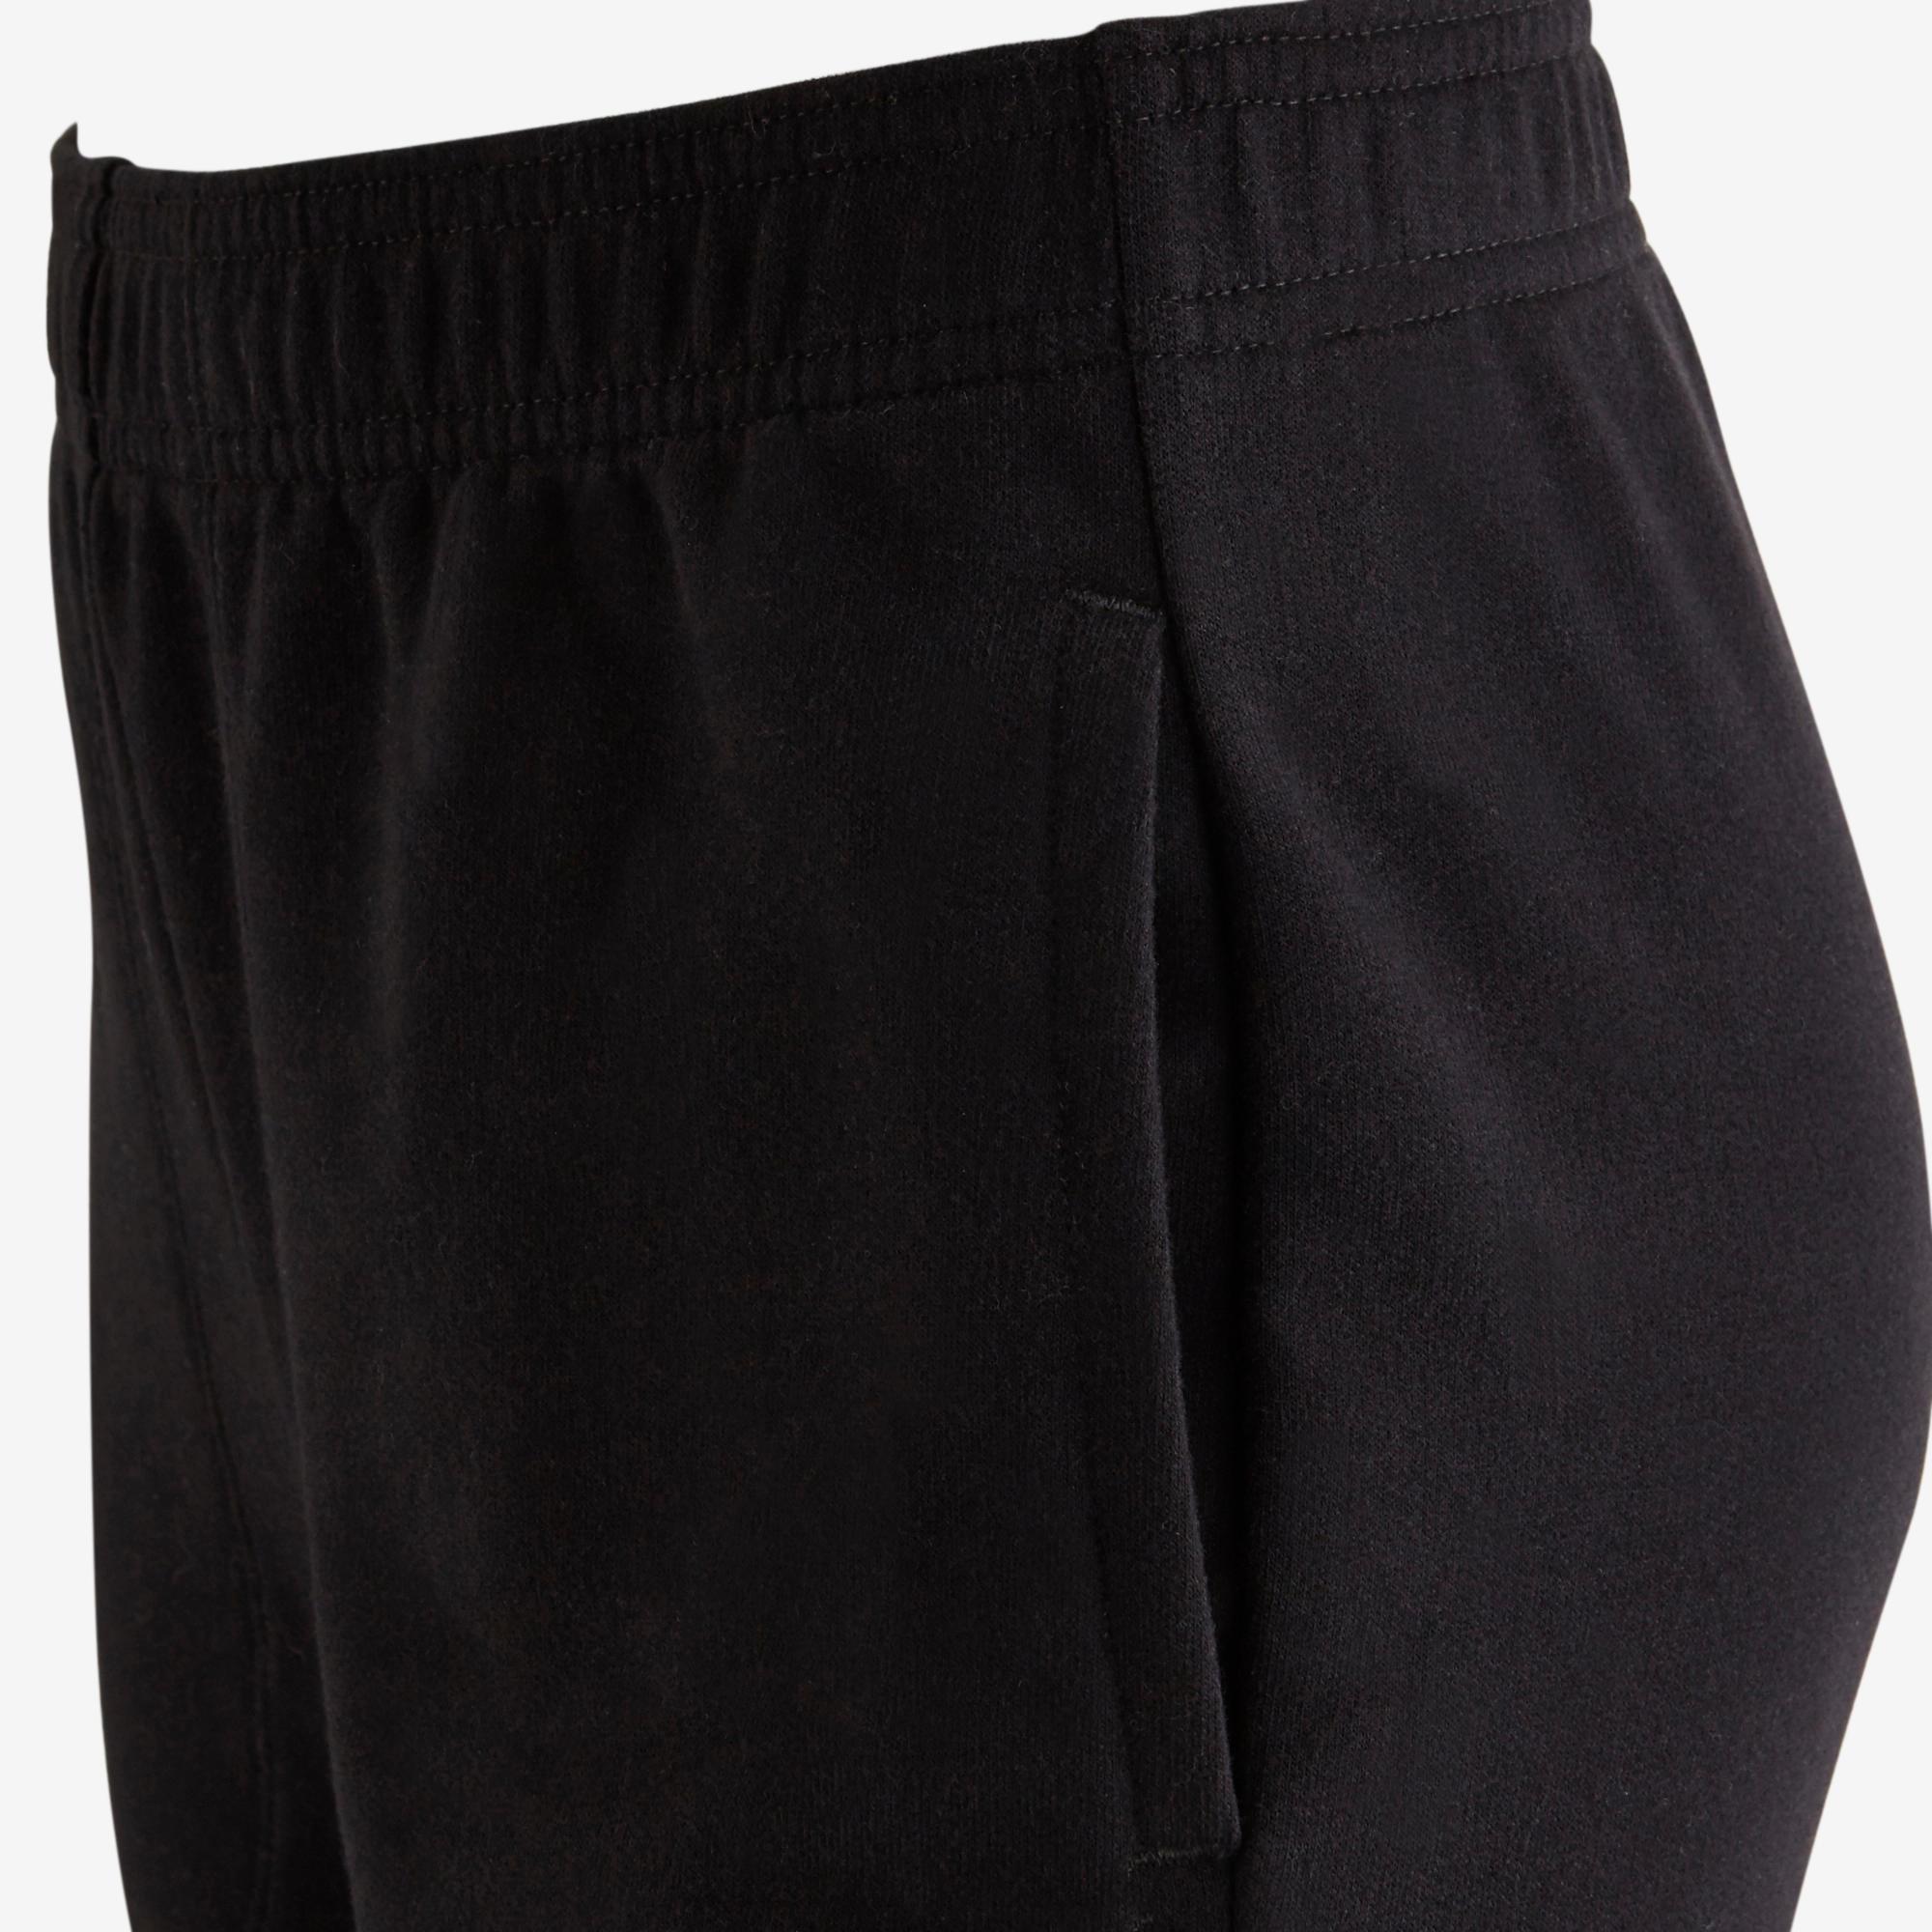 100 Girls' Gym Bottoms - Black